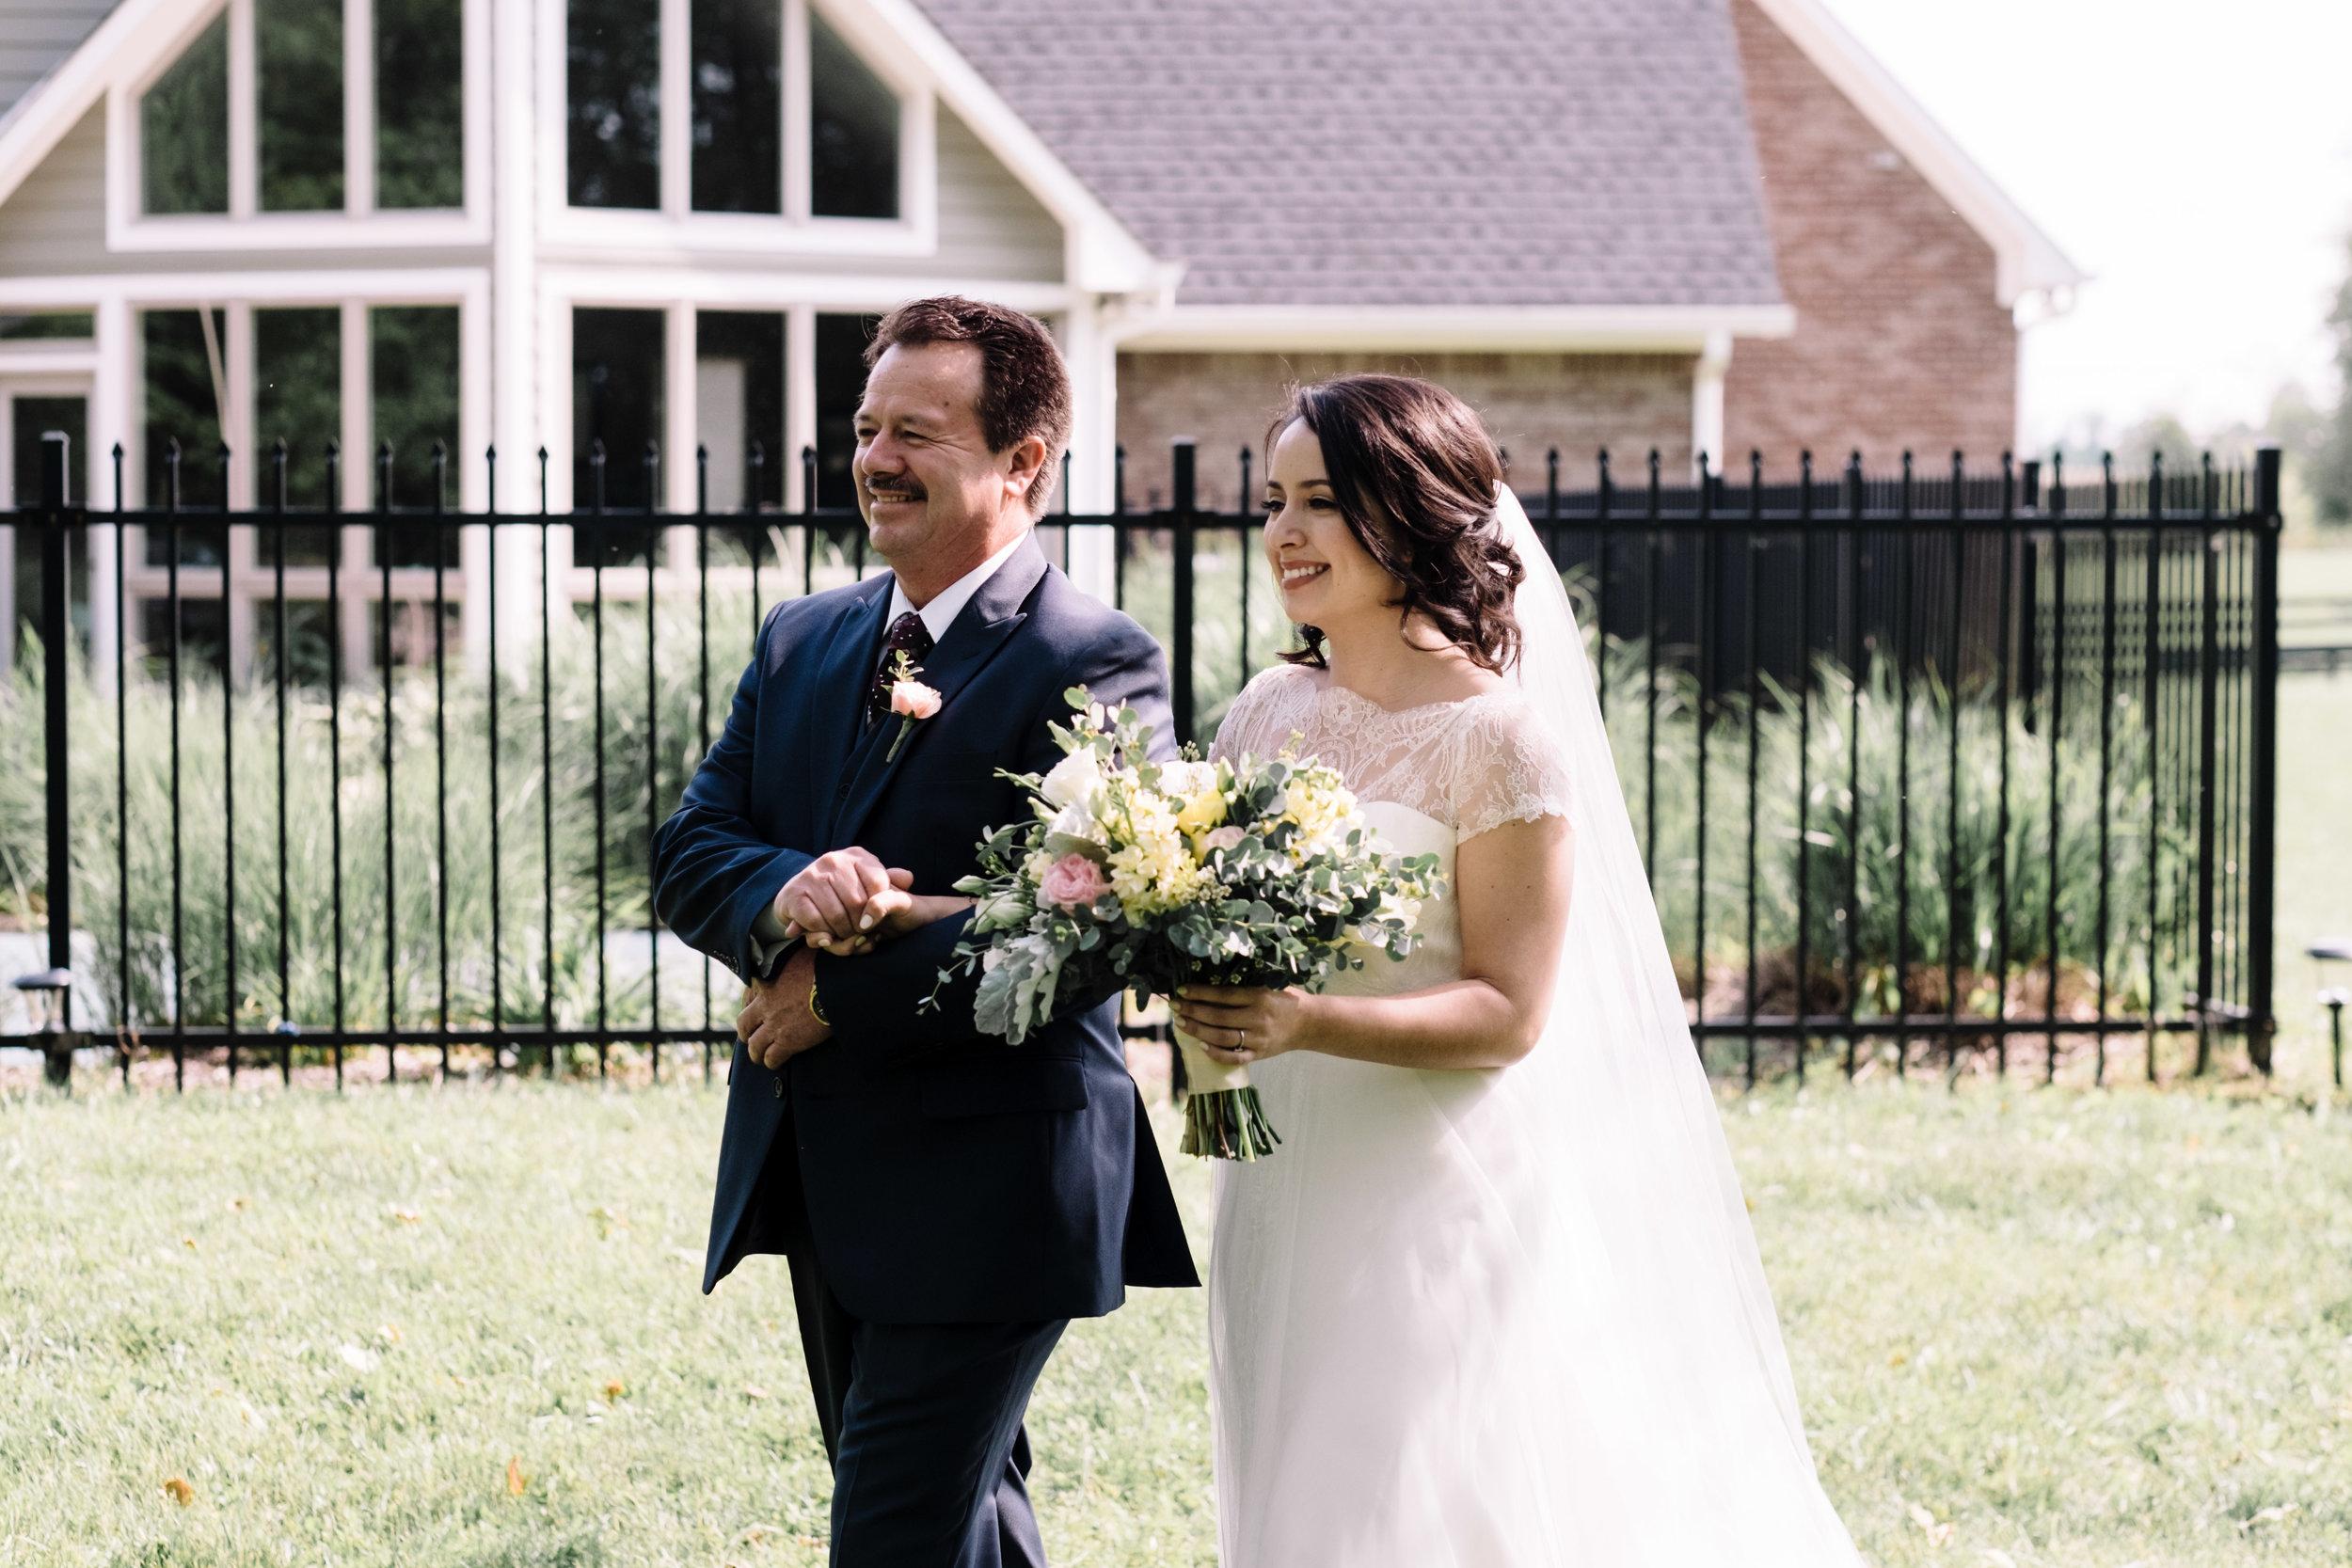 Ana-Dan-Blog-Indianapolis-Wedding-38.jpg